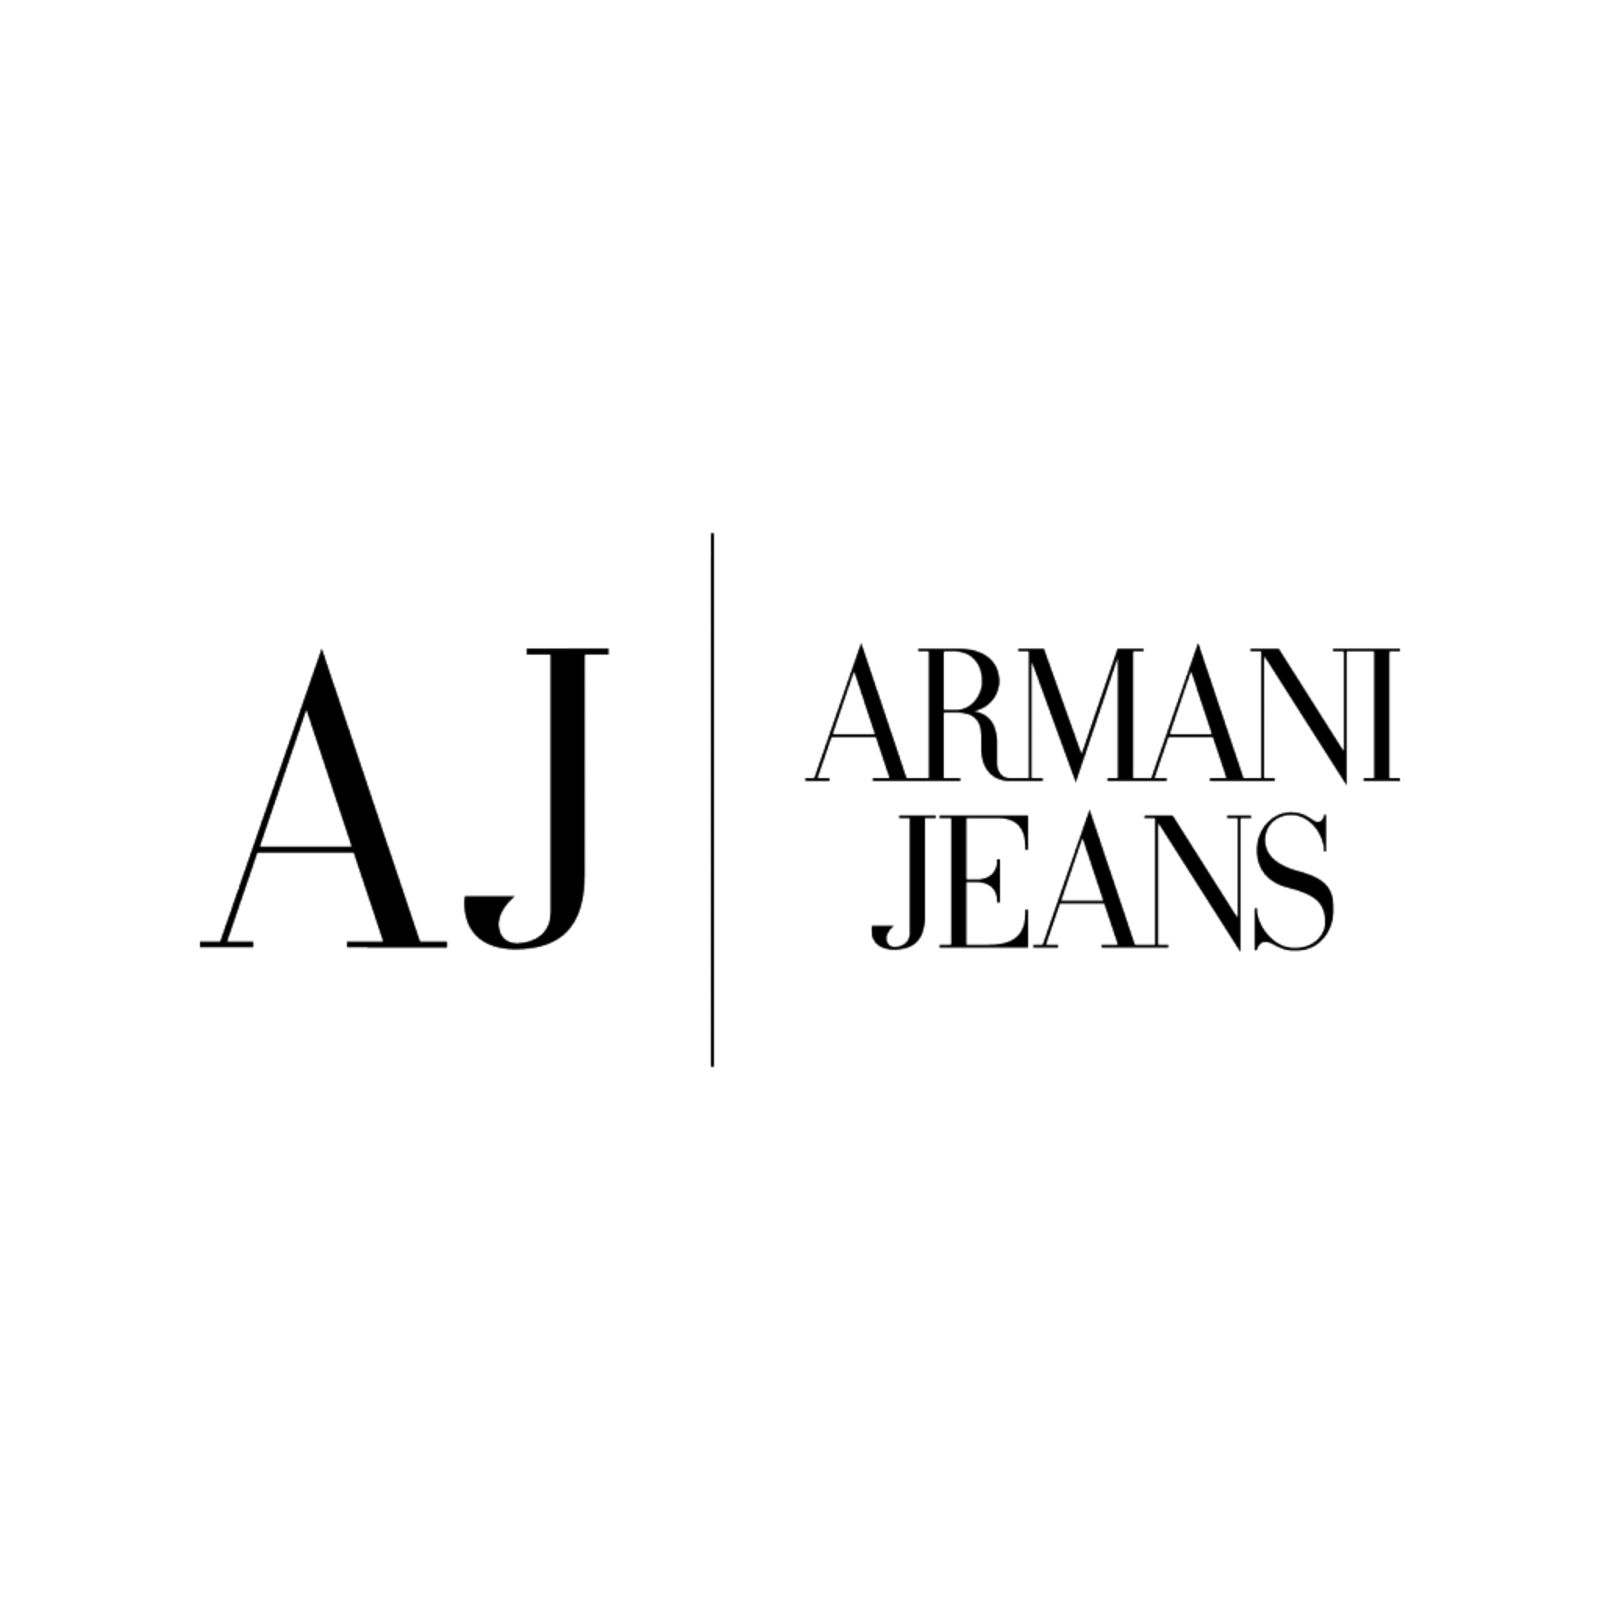 ARMANI JEANS (Bild 1)